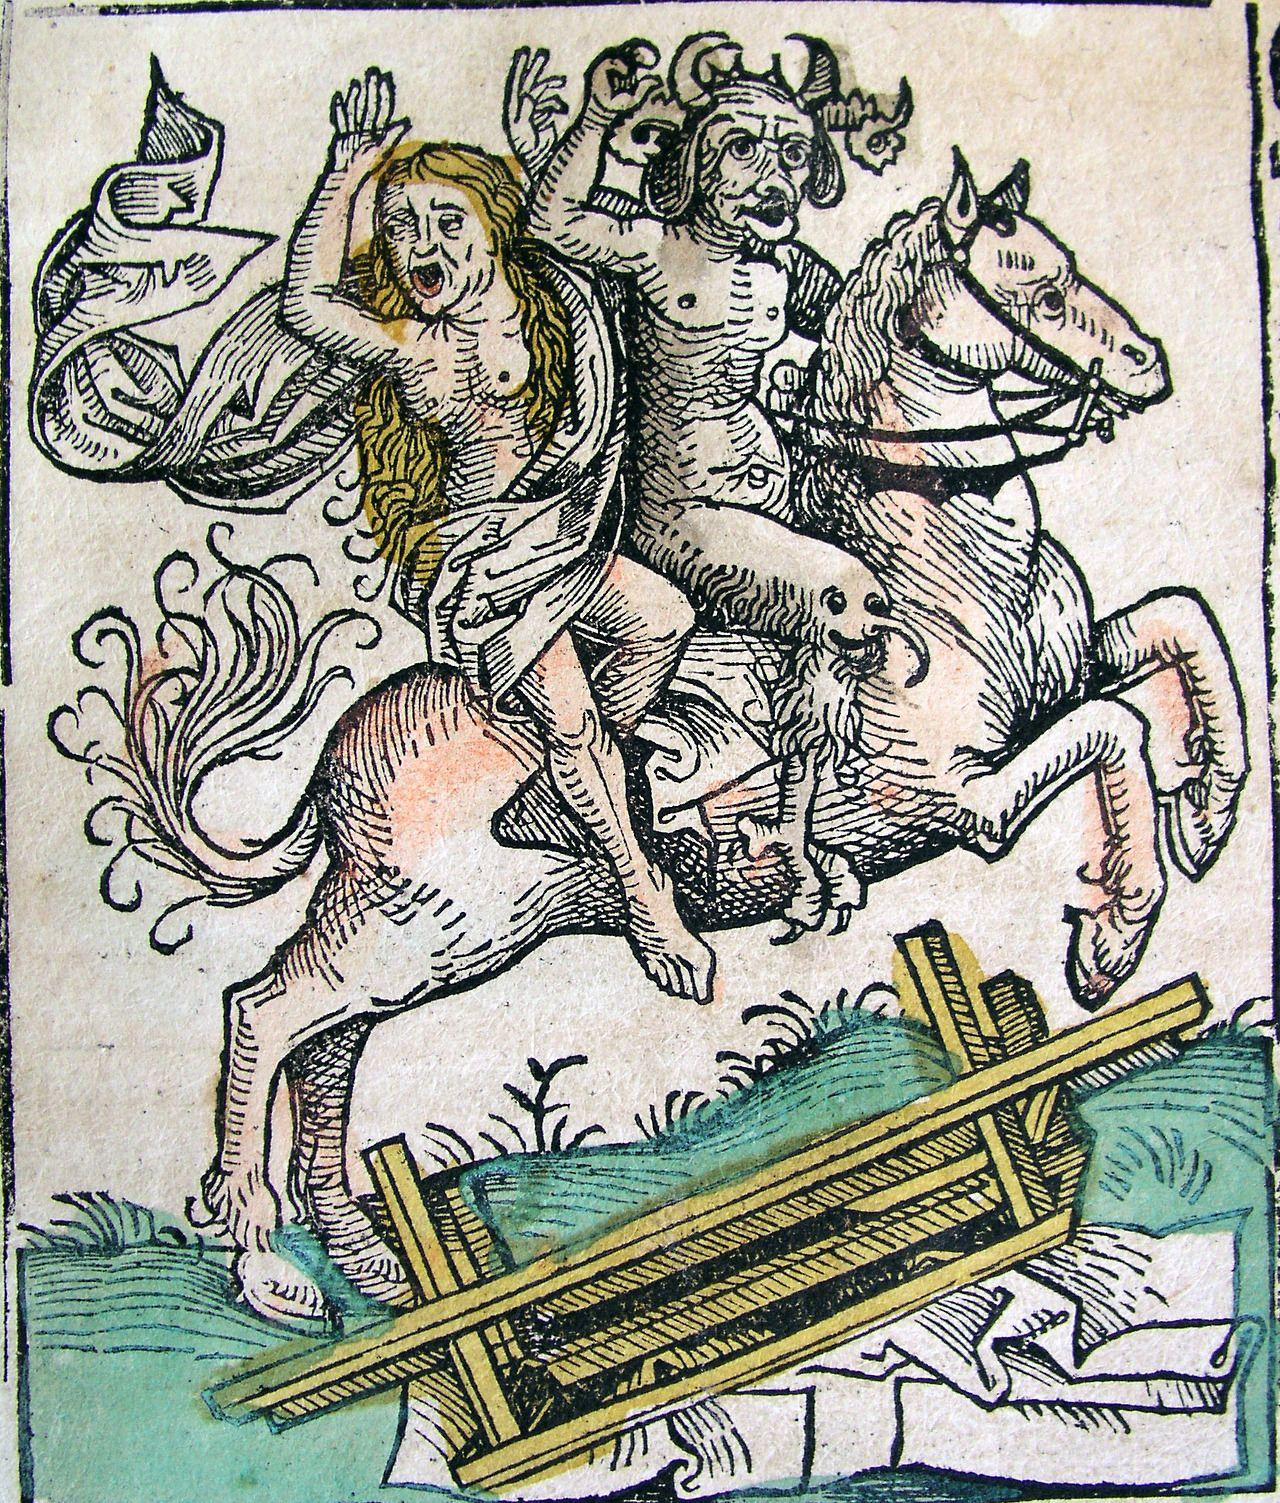 Hartmann Schedel, Nuremberg Chronicle (1493) Devil and woman on horseback.